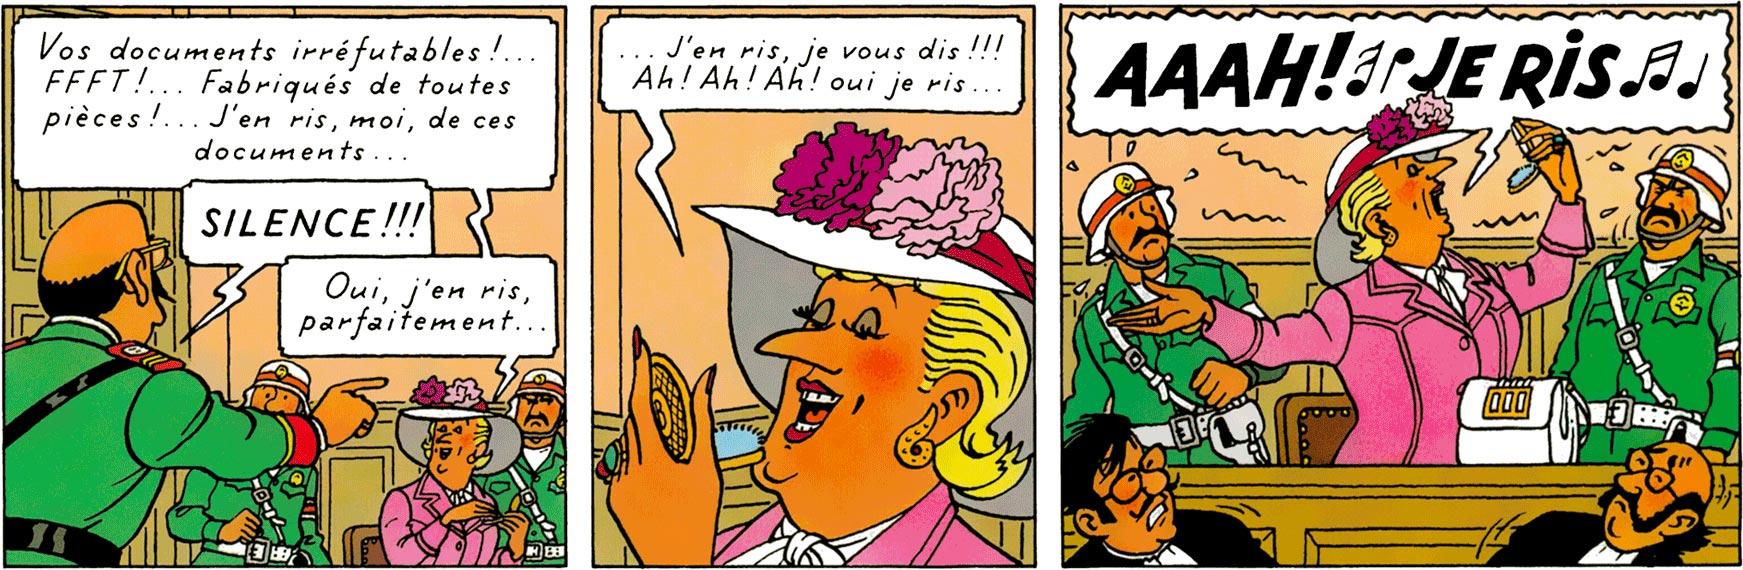 La Castafiore dans Tintin et les Picaros